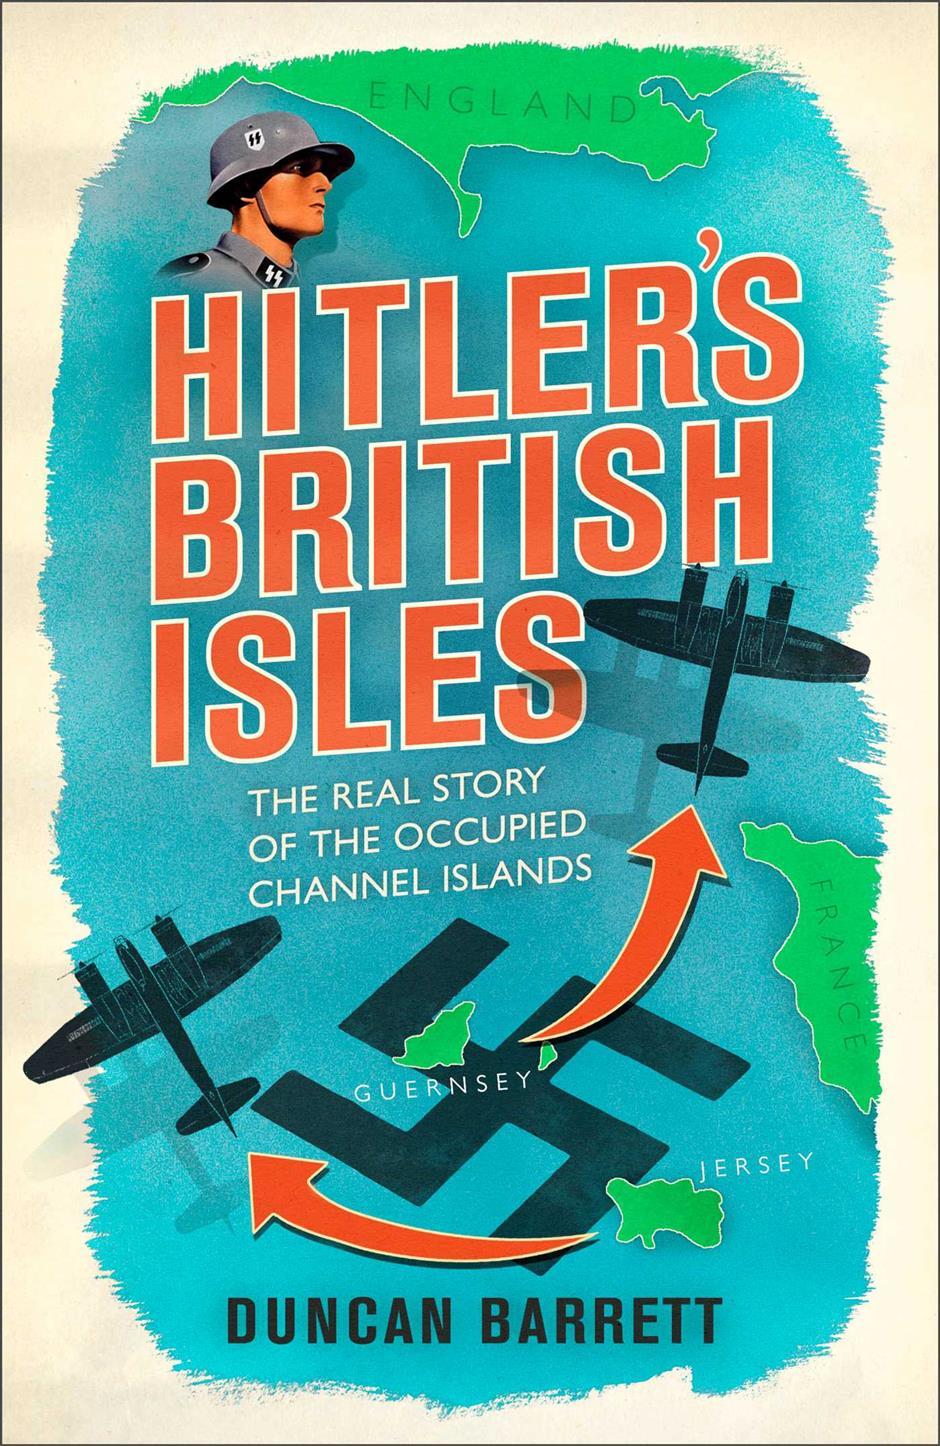 Duncan Barrett: Hitler's British Isles